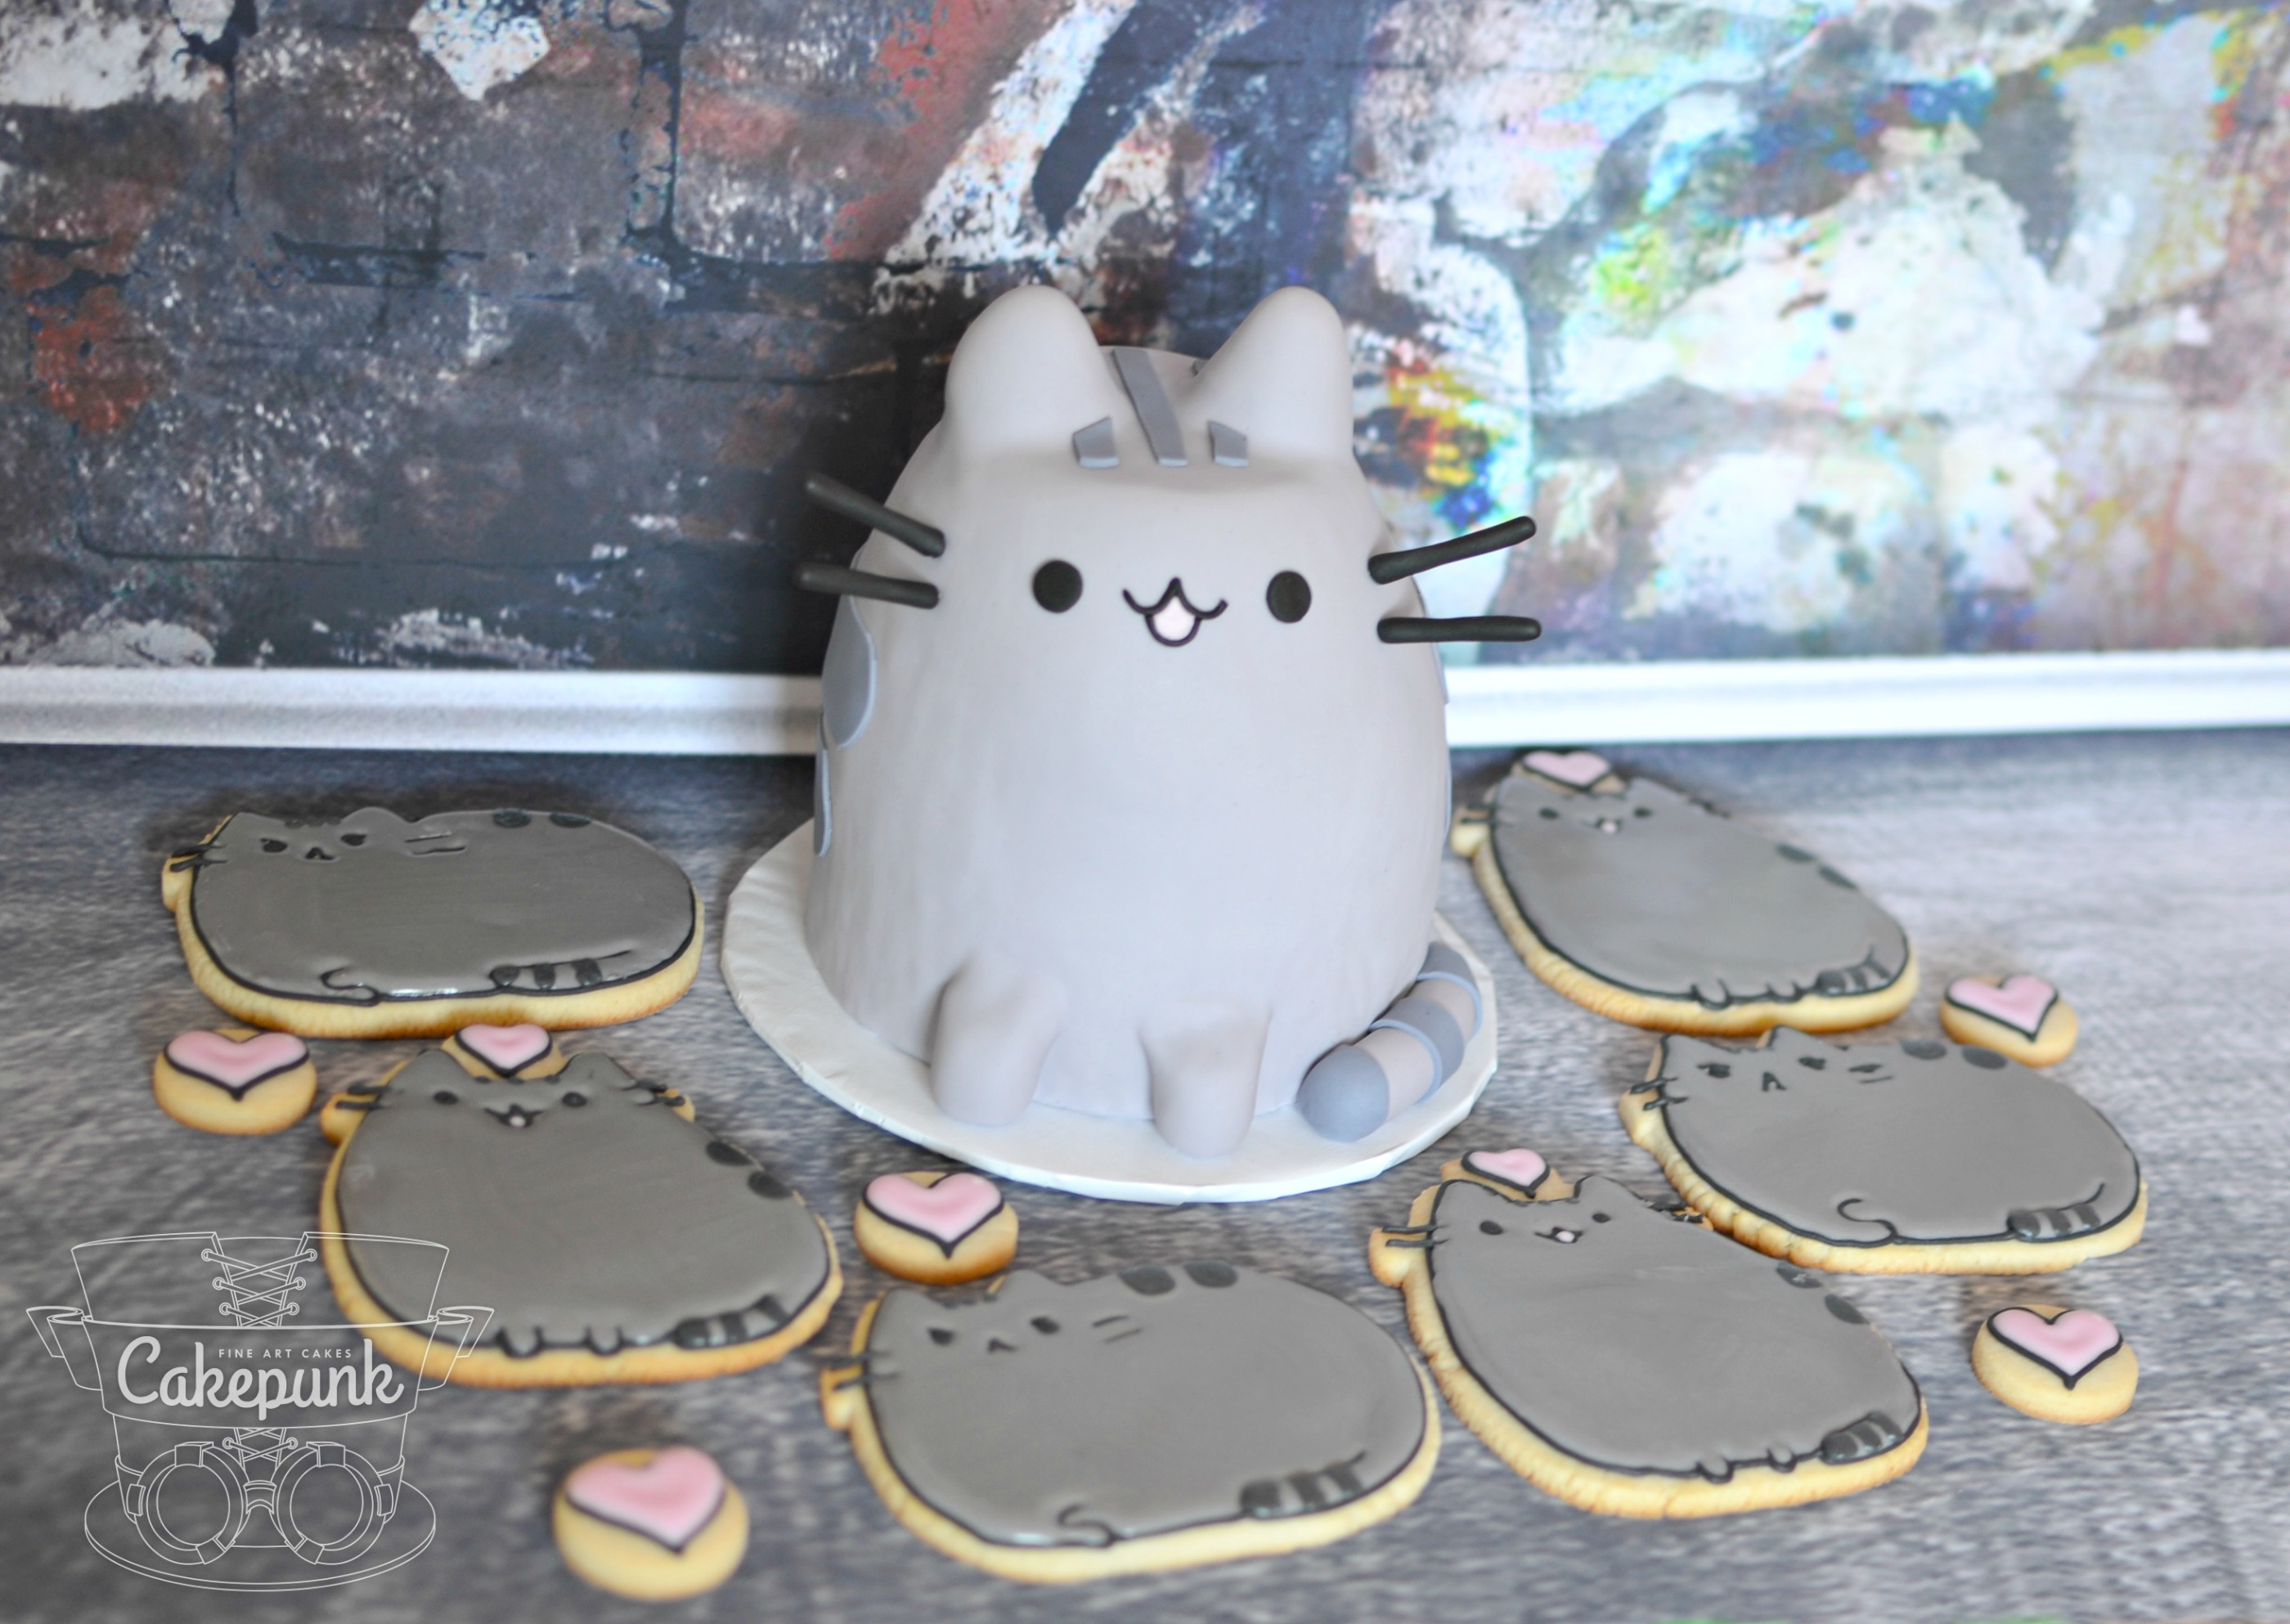 Pusheen Cake and Cookies